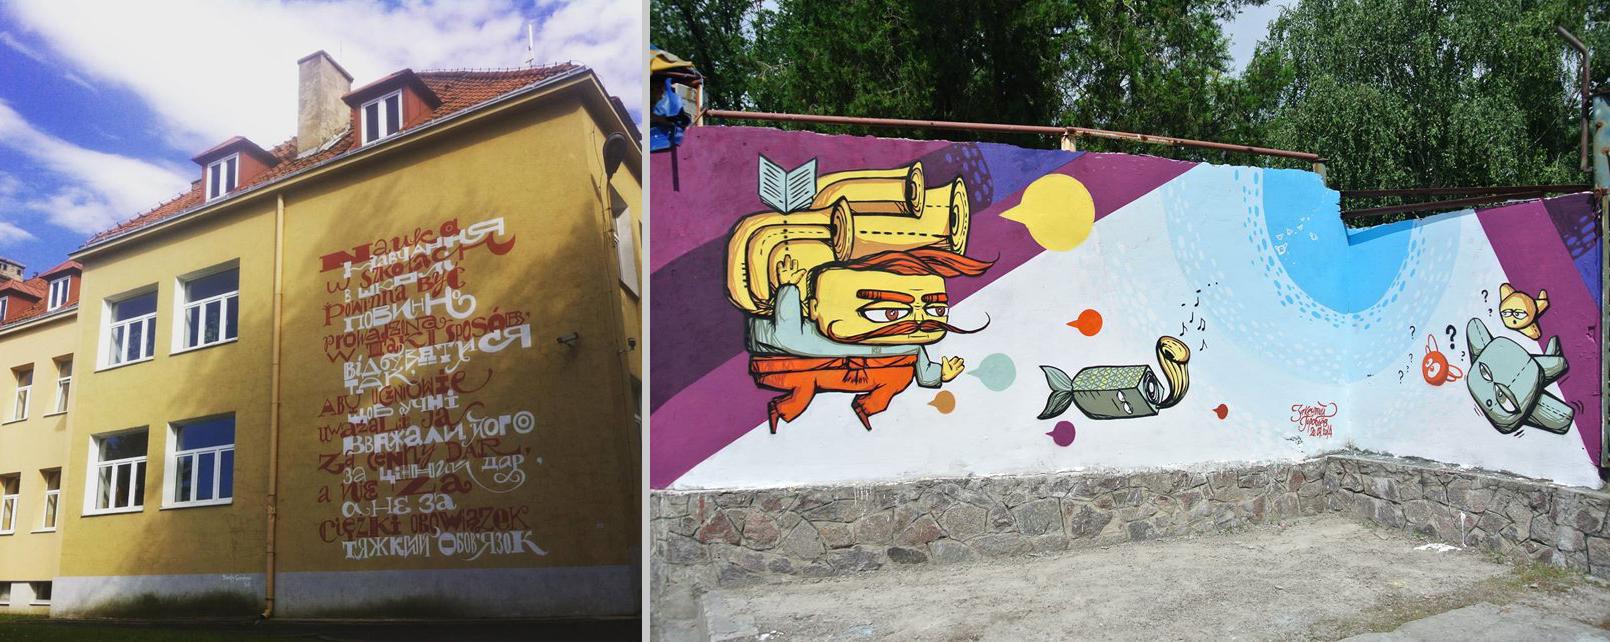 Слева - проект в Клементовице, справа - в Кременчуге